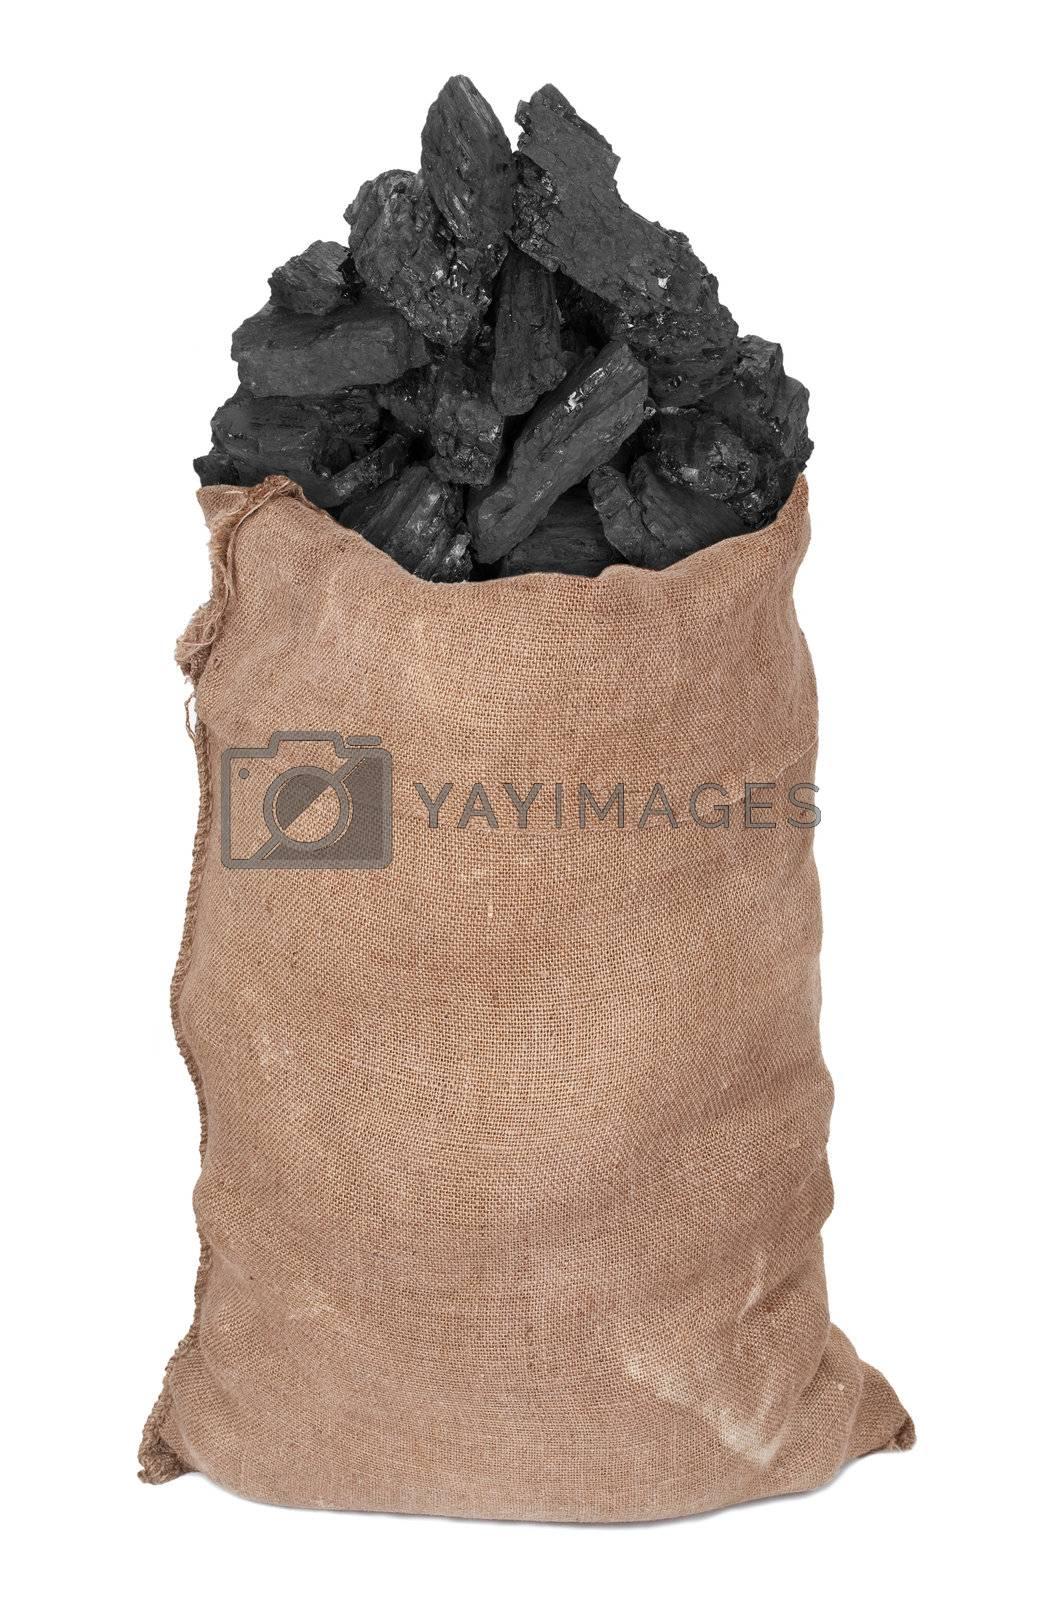 Coal in big sack